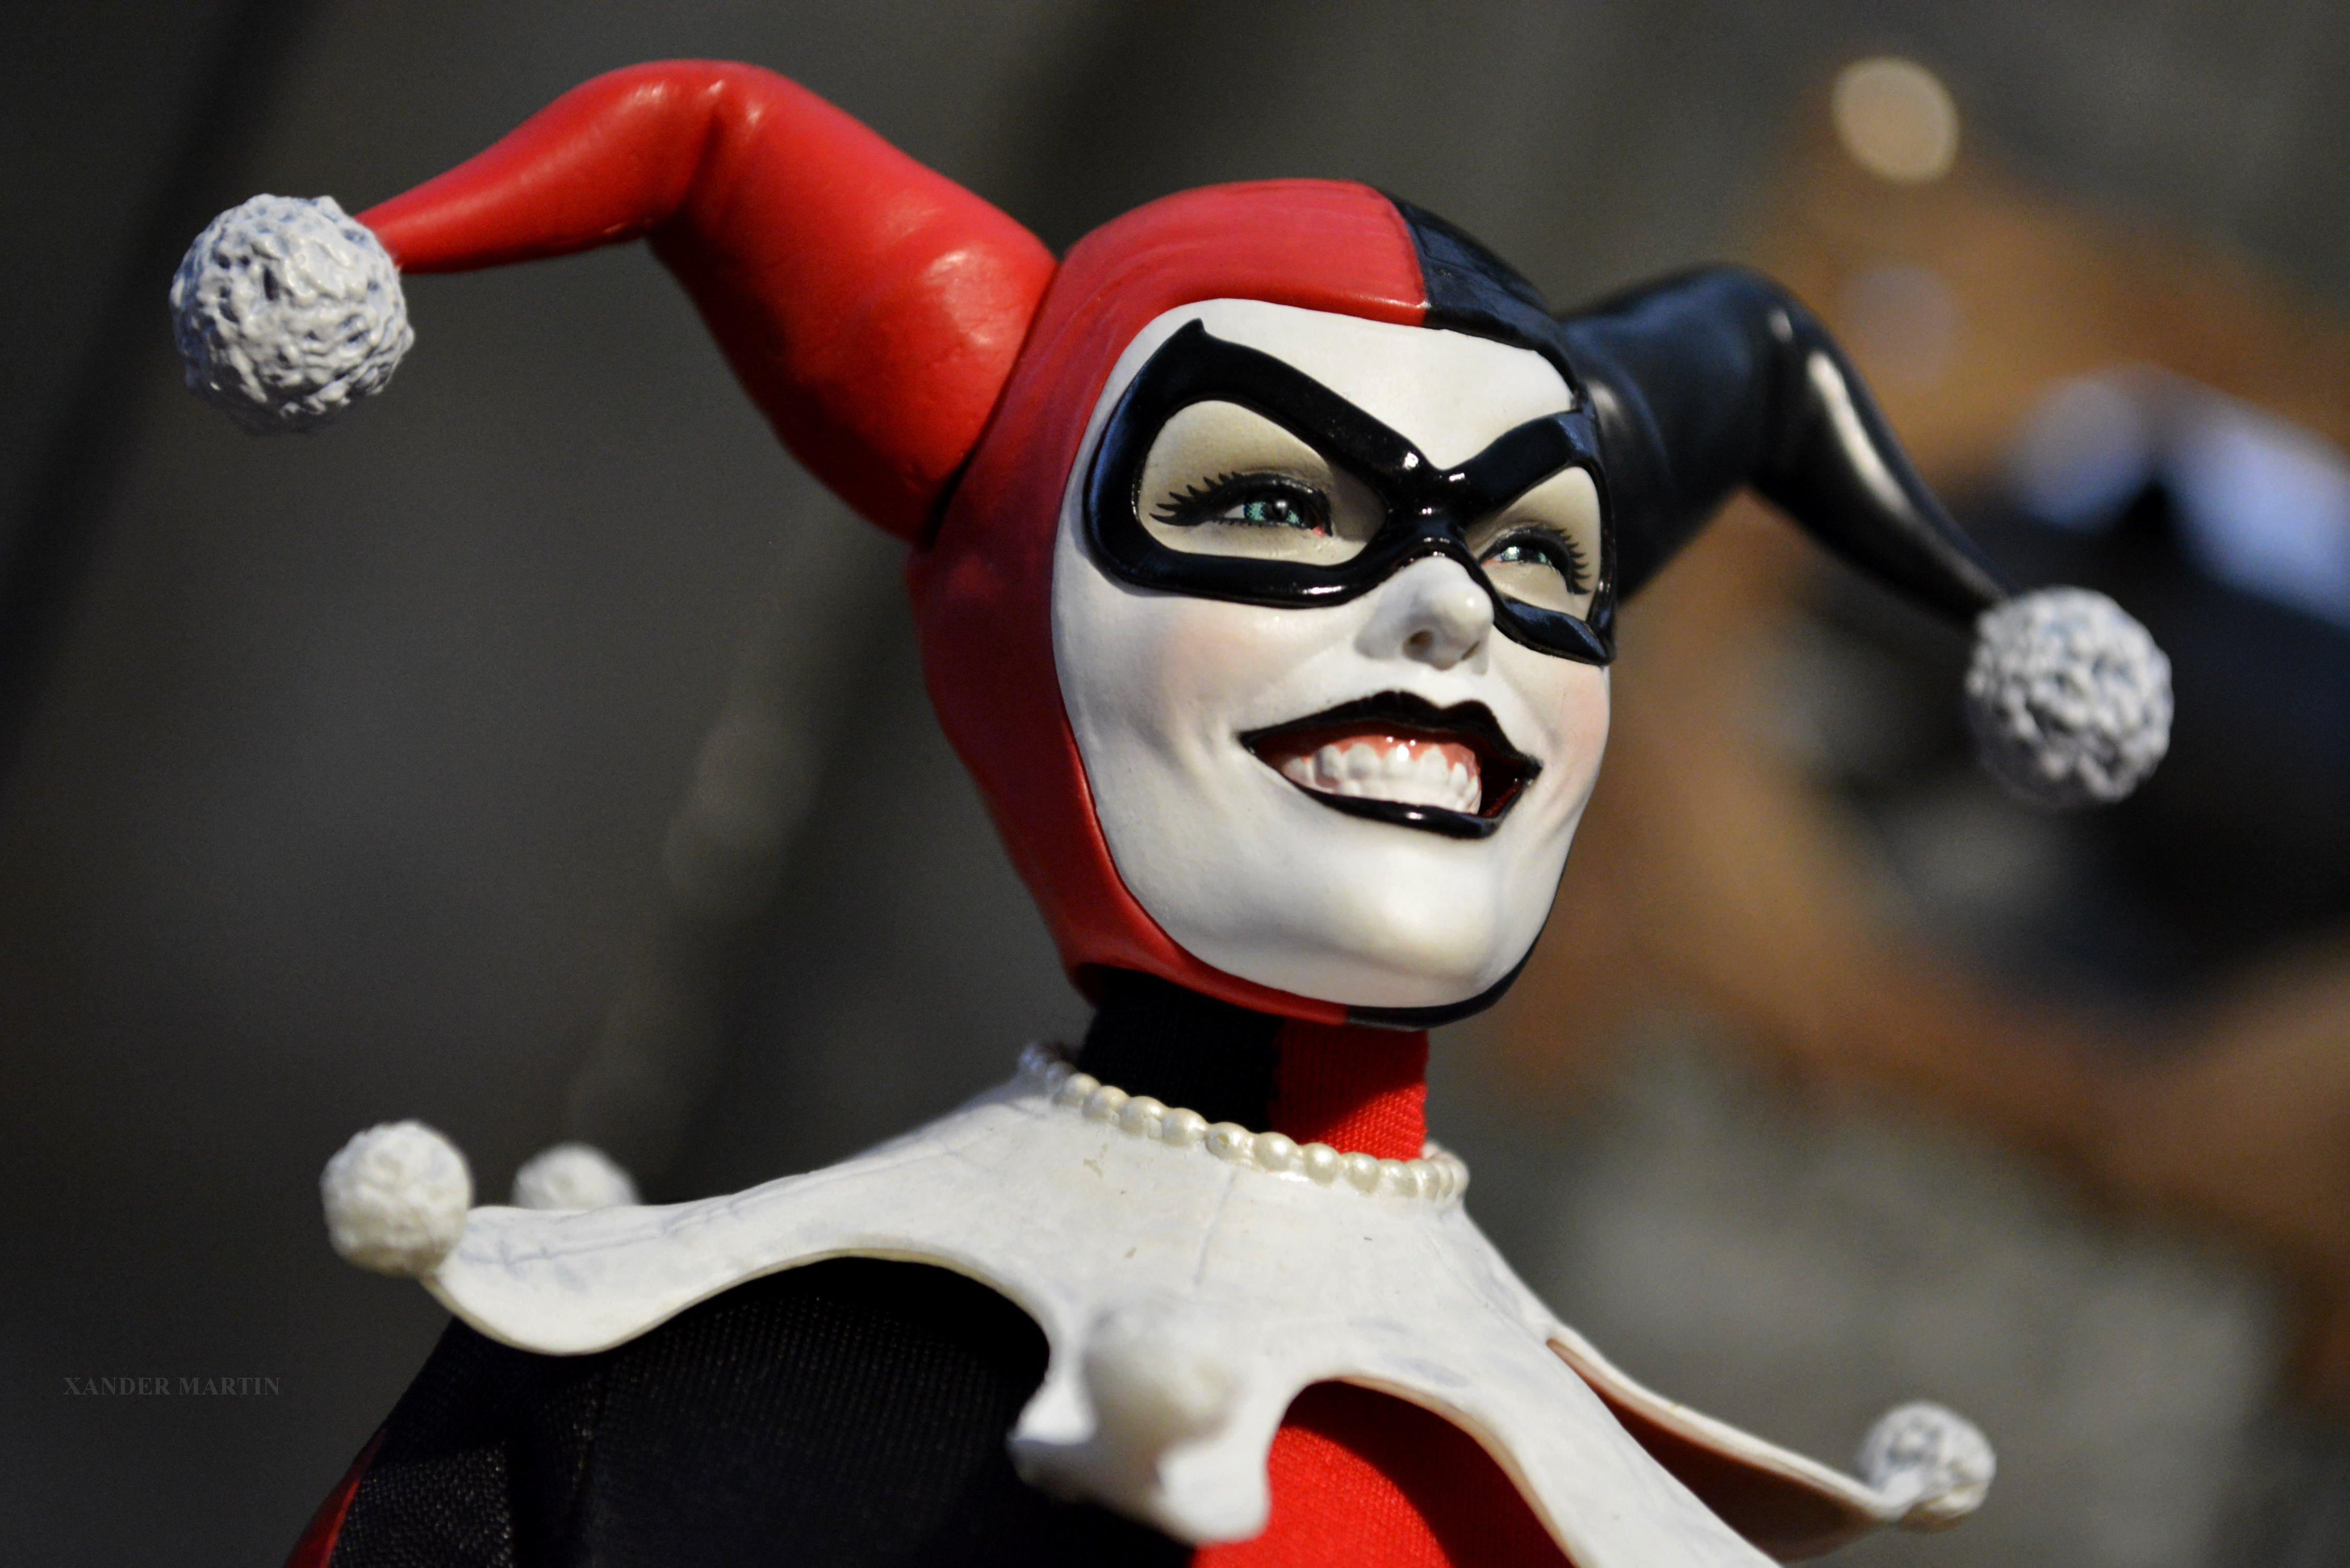 Hintergrundbilder : Rahmen, Robin, Action Figur, Zahl, Batman, Joker ...